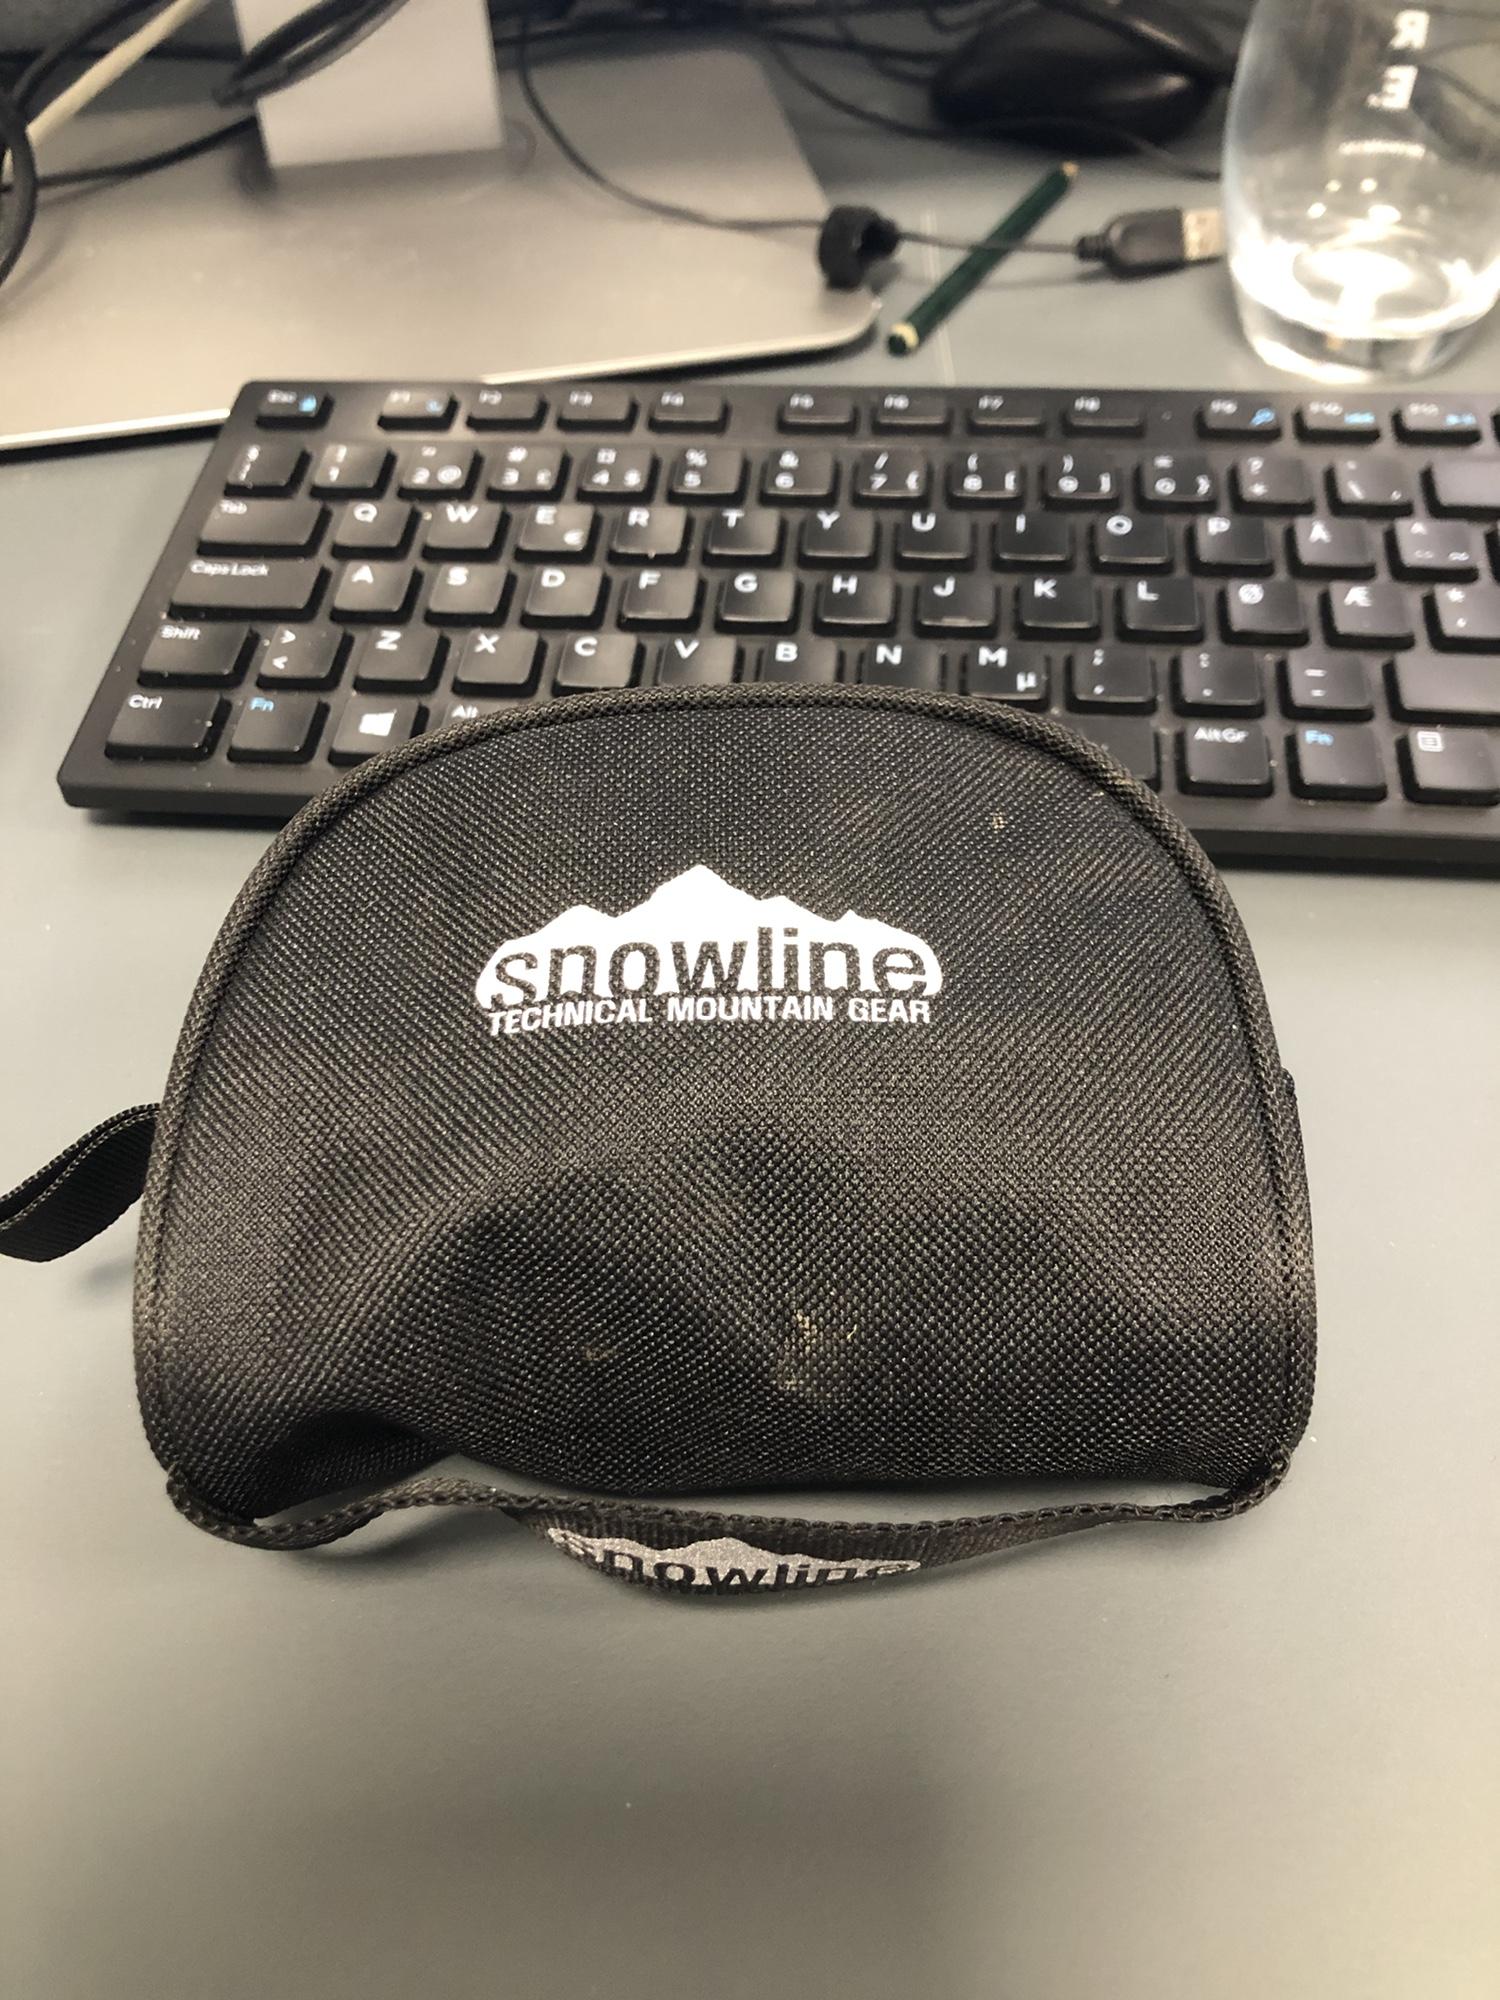 snowline technical mountain gear